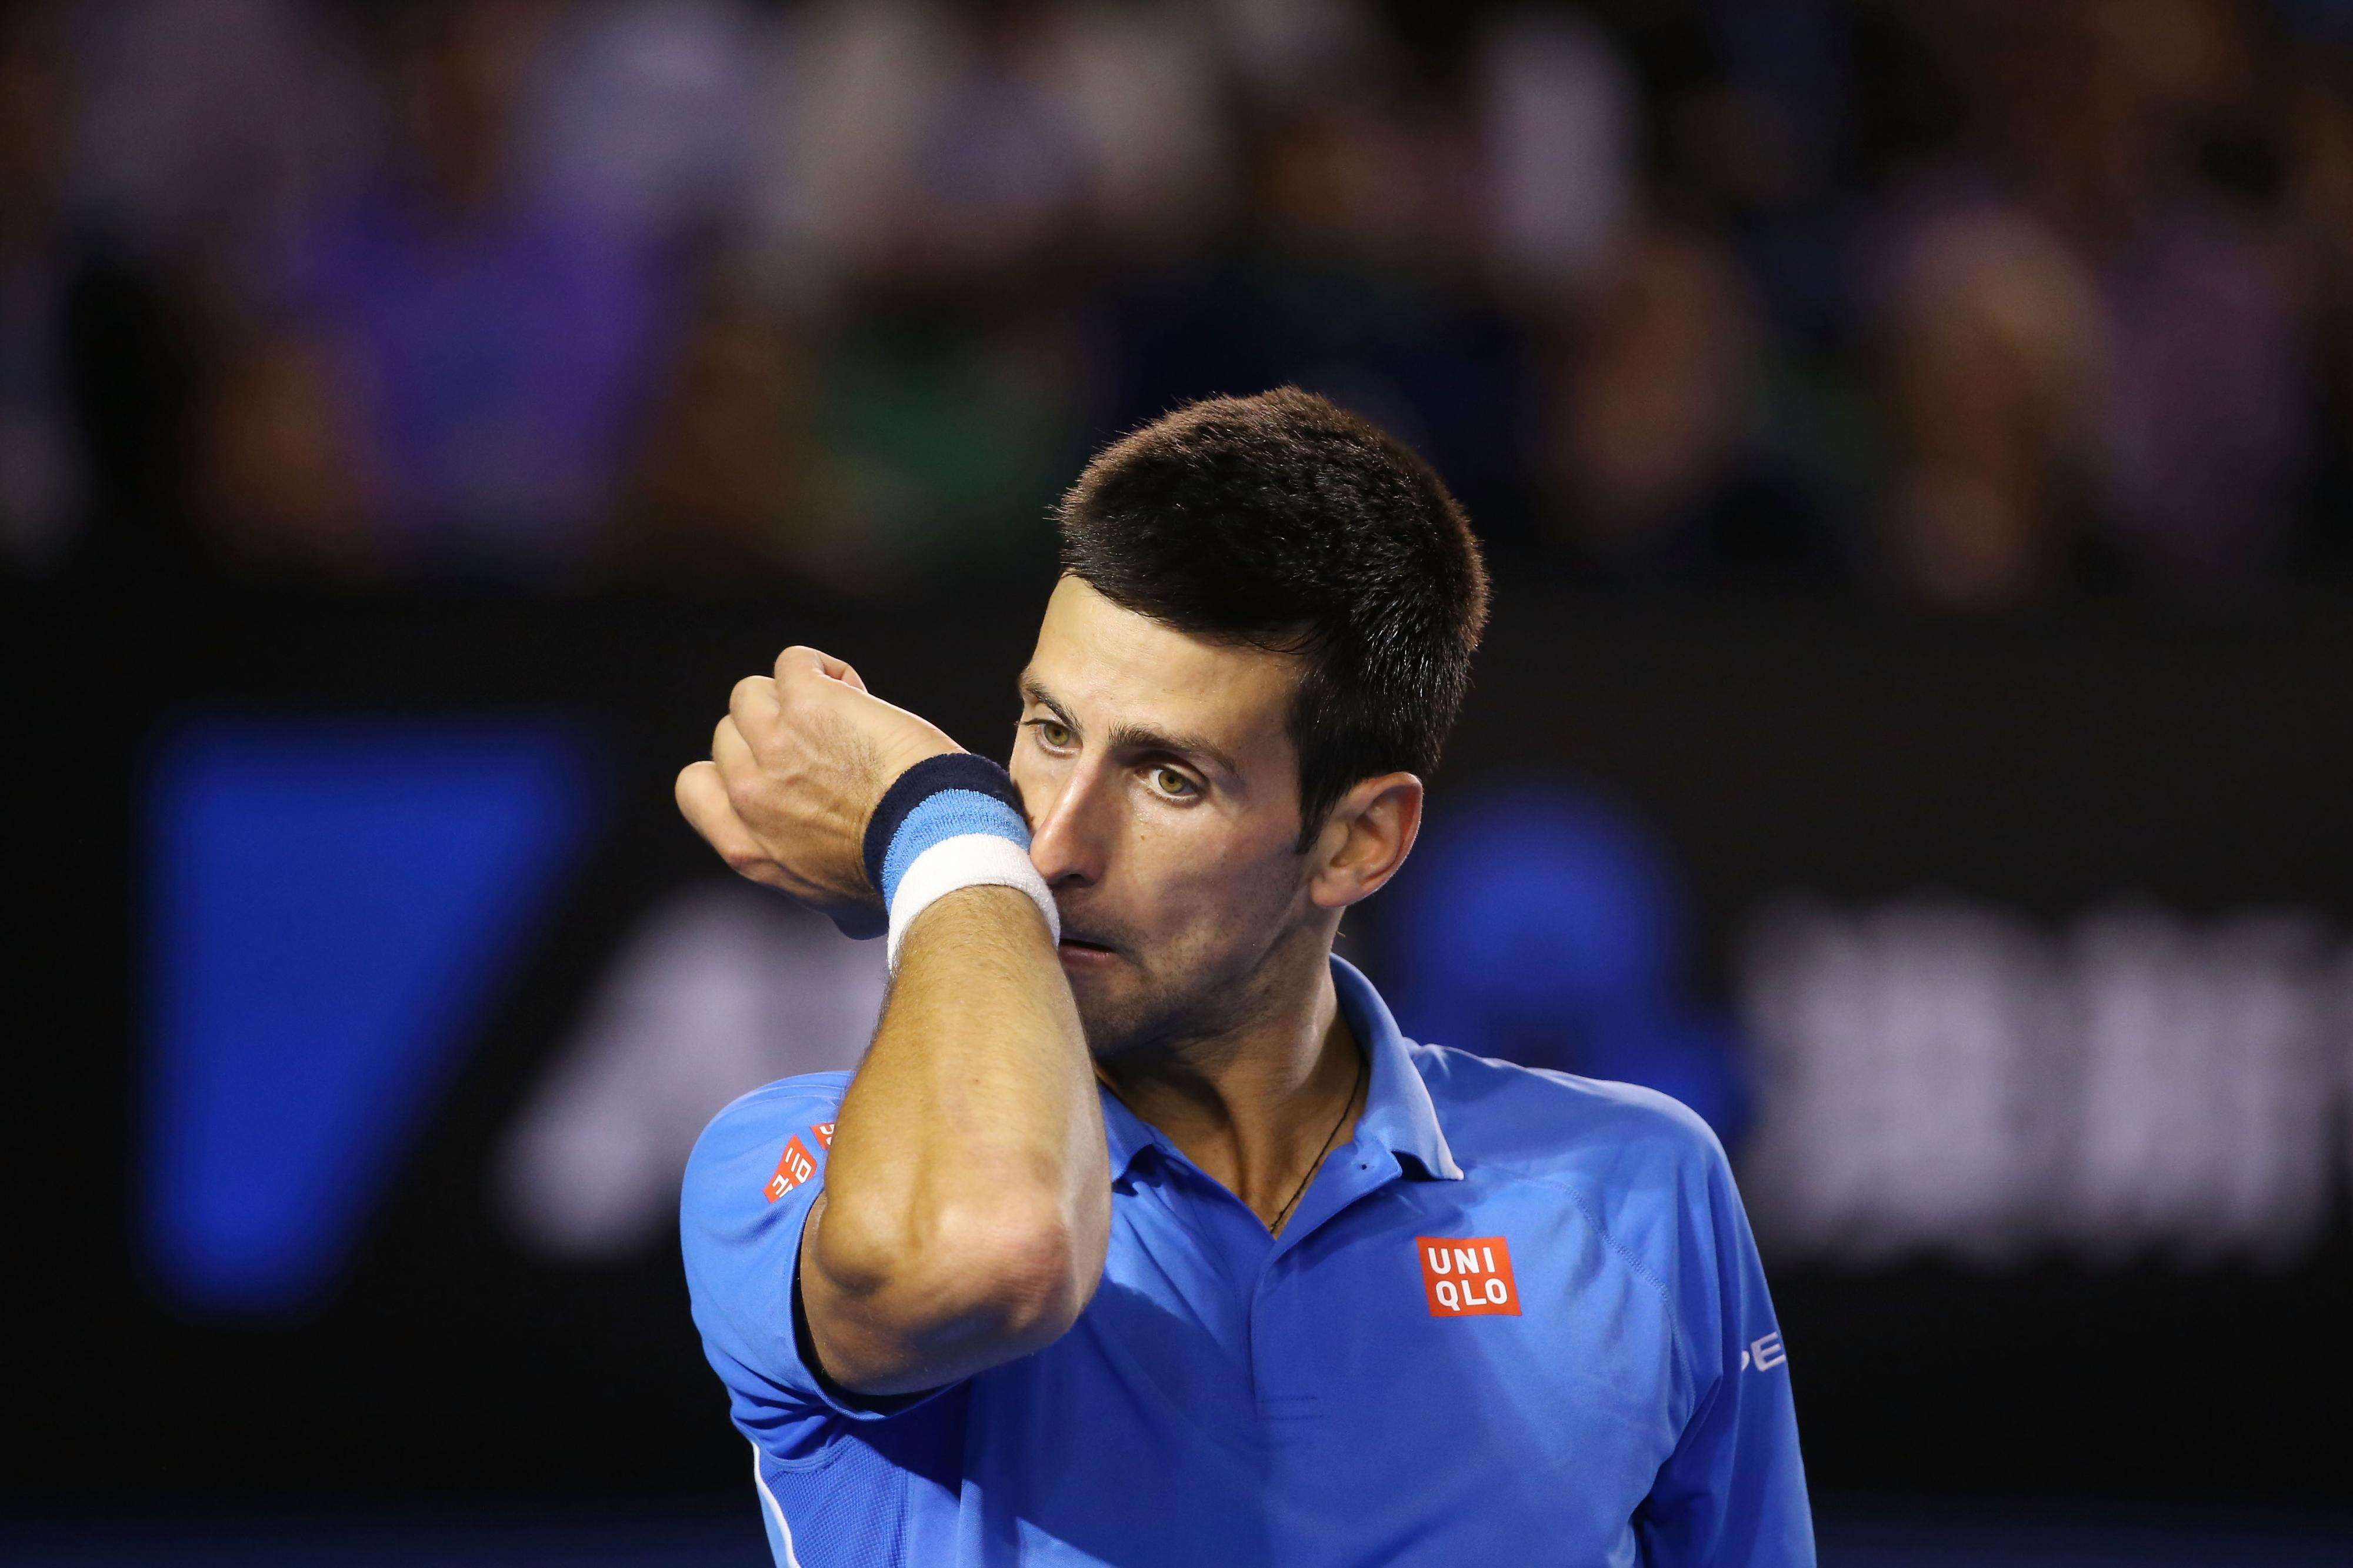 Djokovic fulminó a Wawrinka y se jugará el Open de Australia contra Murray. Foto: Getty Images